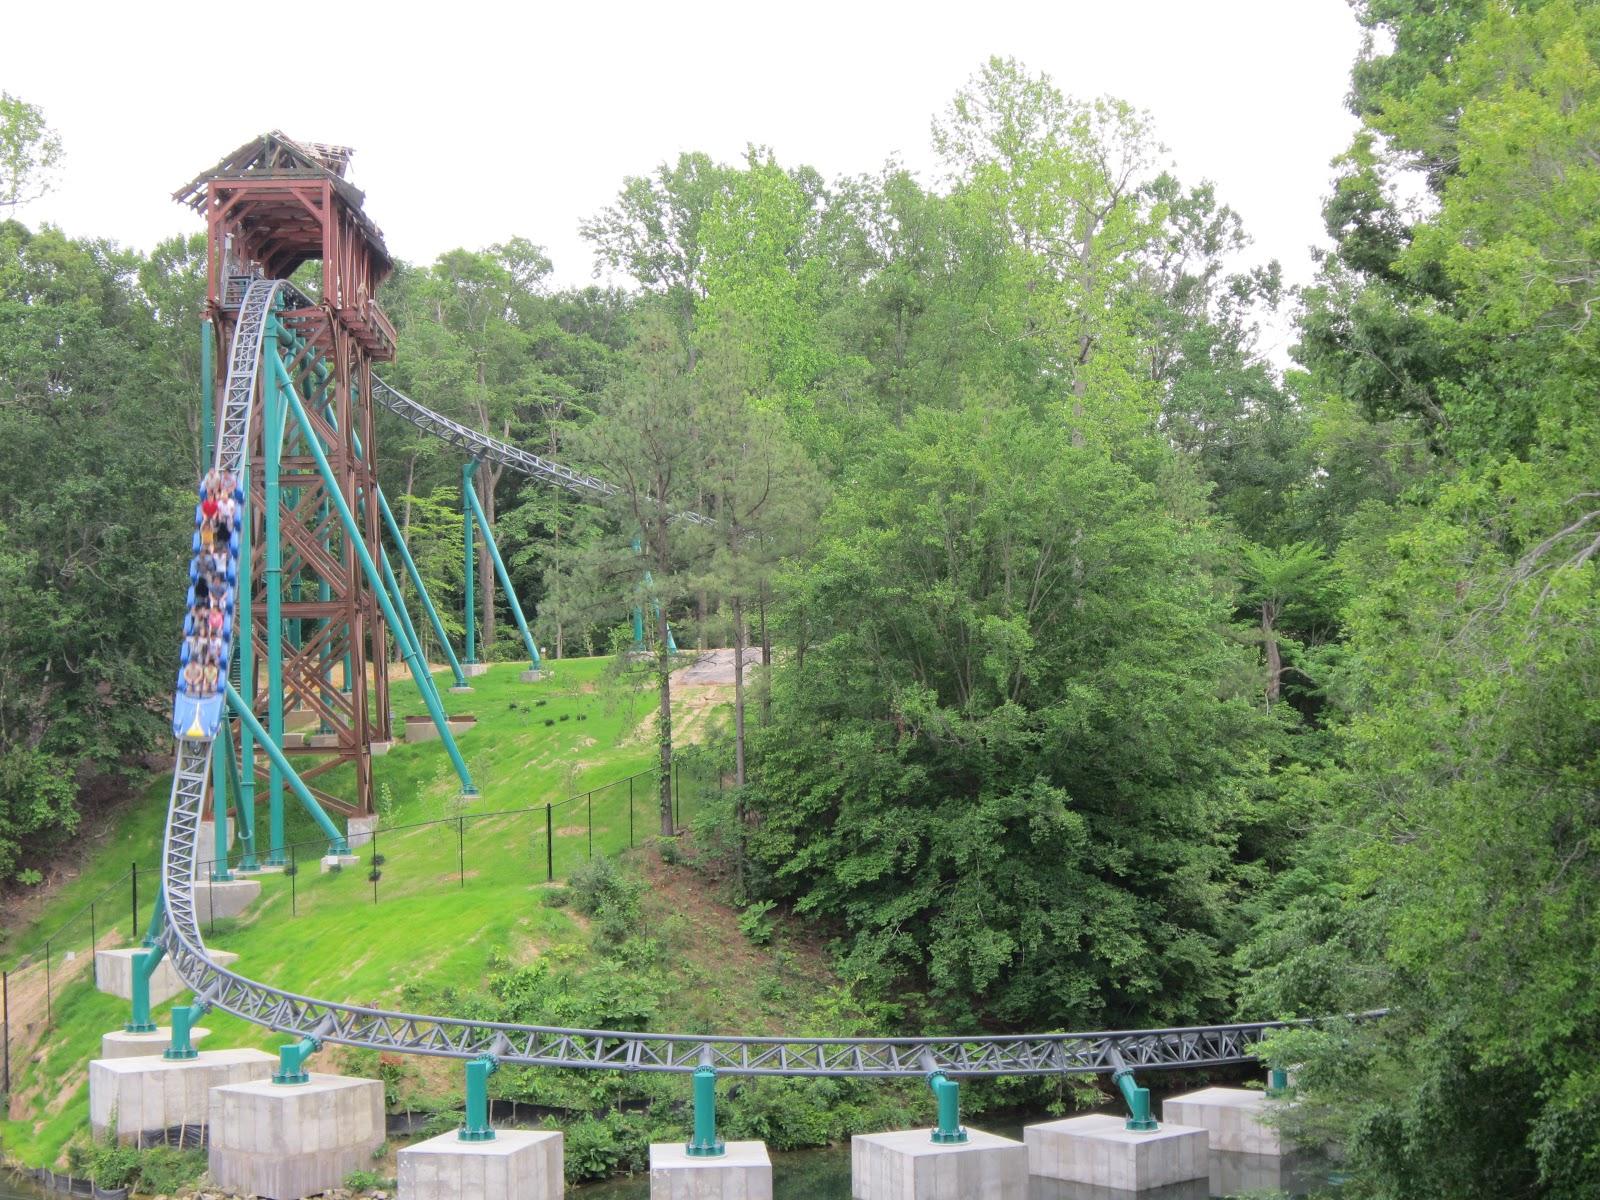 Verbolten Roller Coaster Busch Gardens